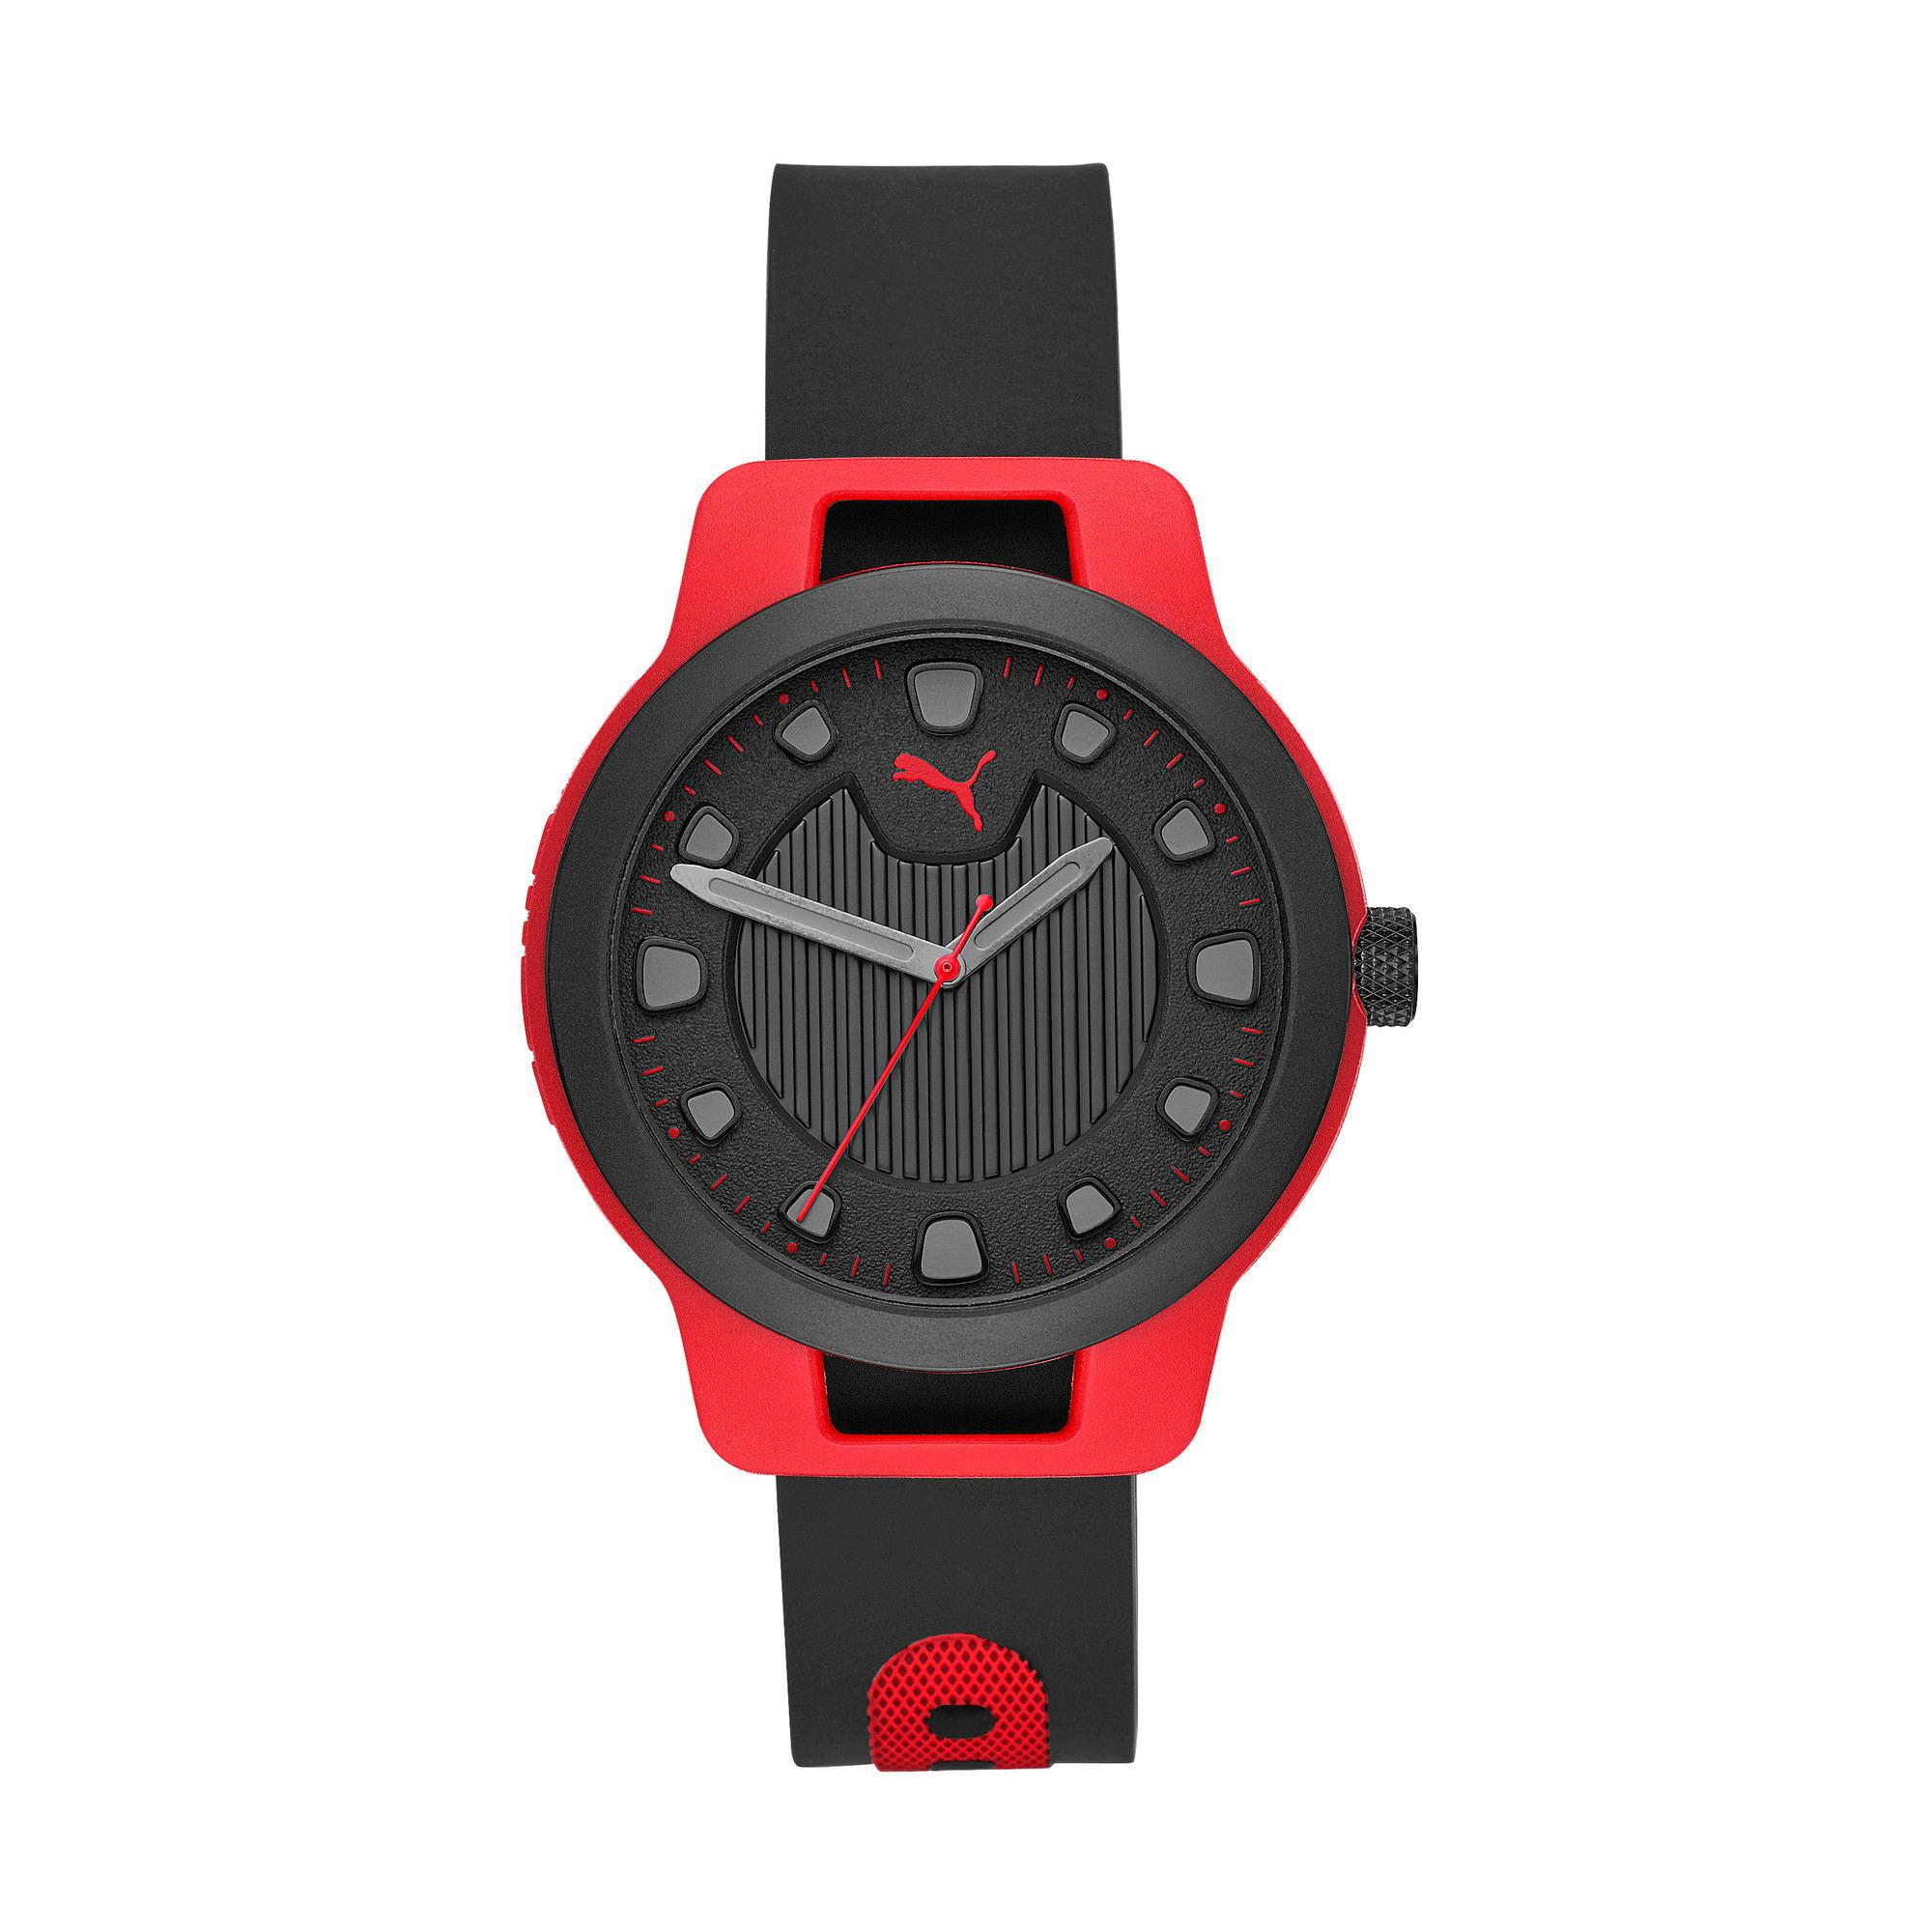 Thumbnail 1 of Reset v1 Watch, Red/Black, medium